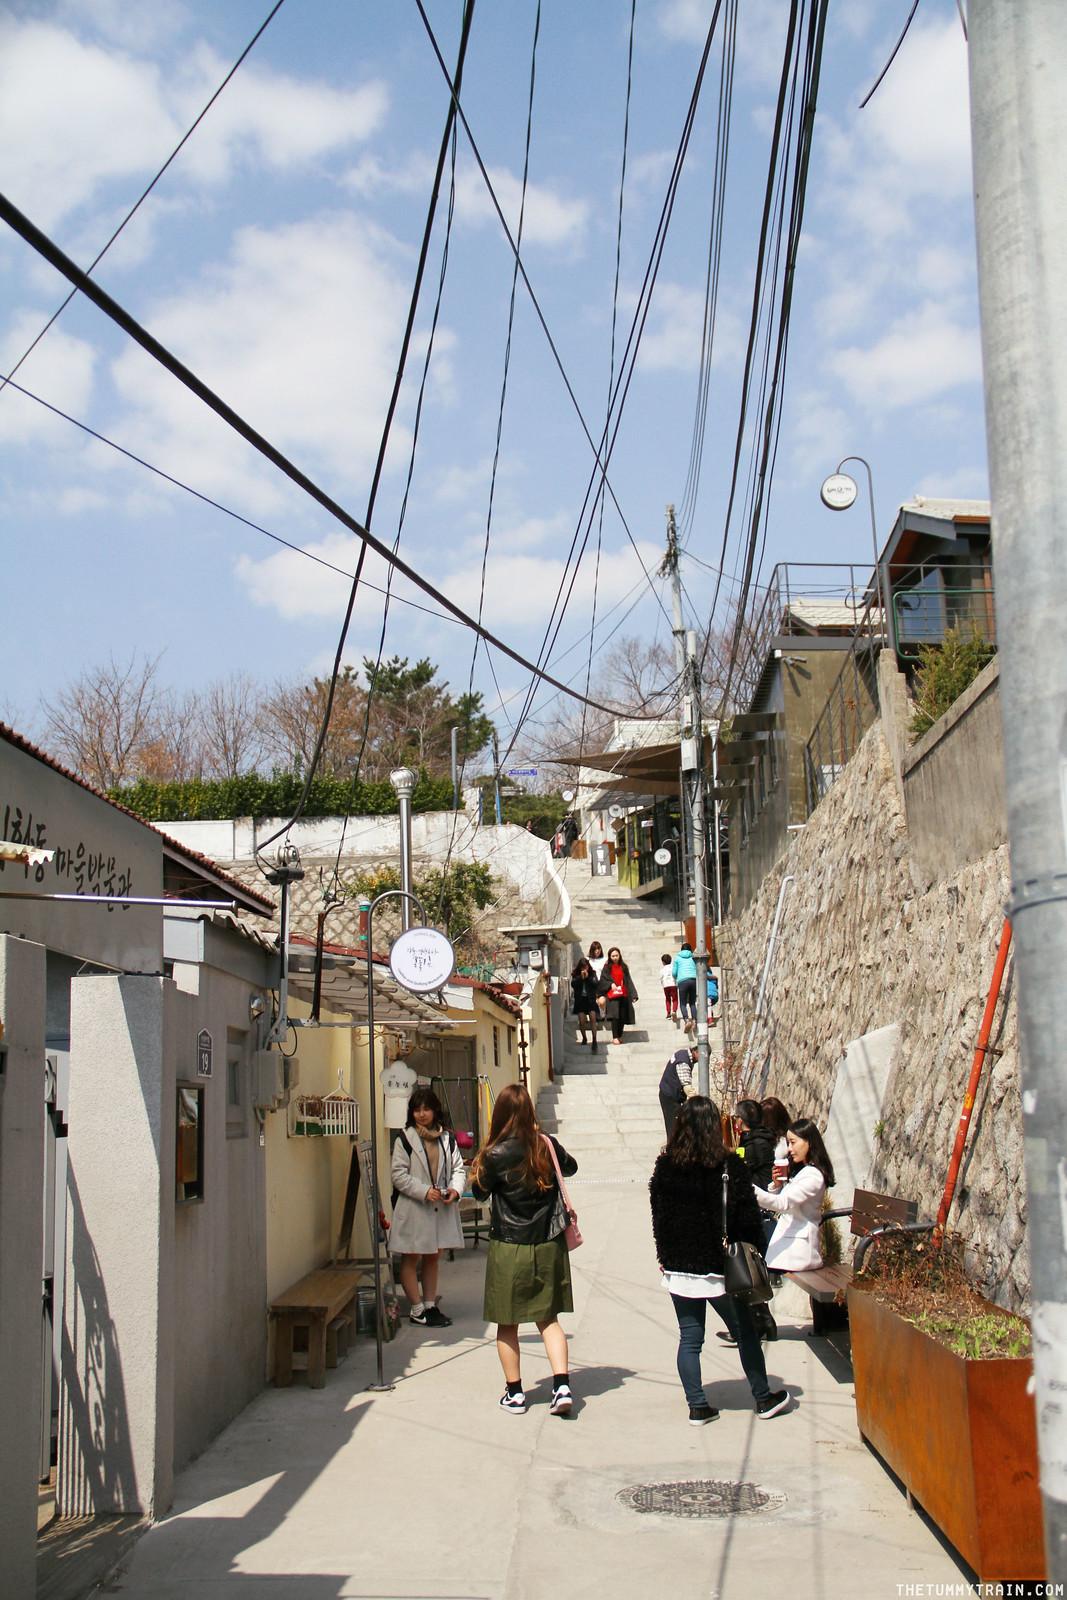 32782172164 c31684937e h - Seoul-ful Spring 2016: A mini exploration of Ihwa Mural Village